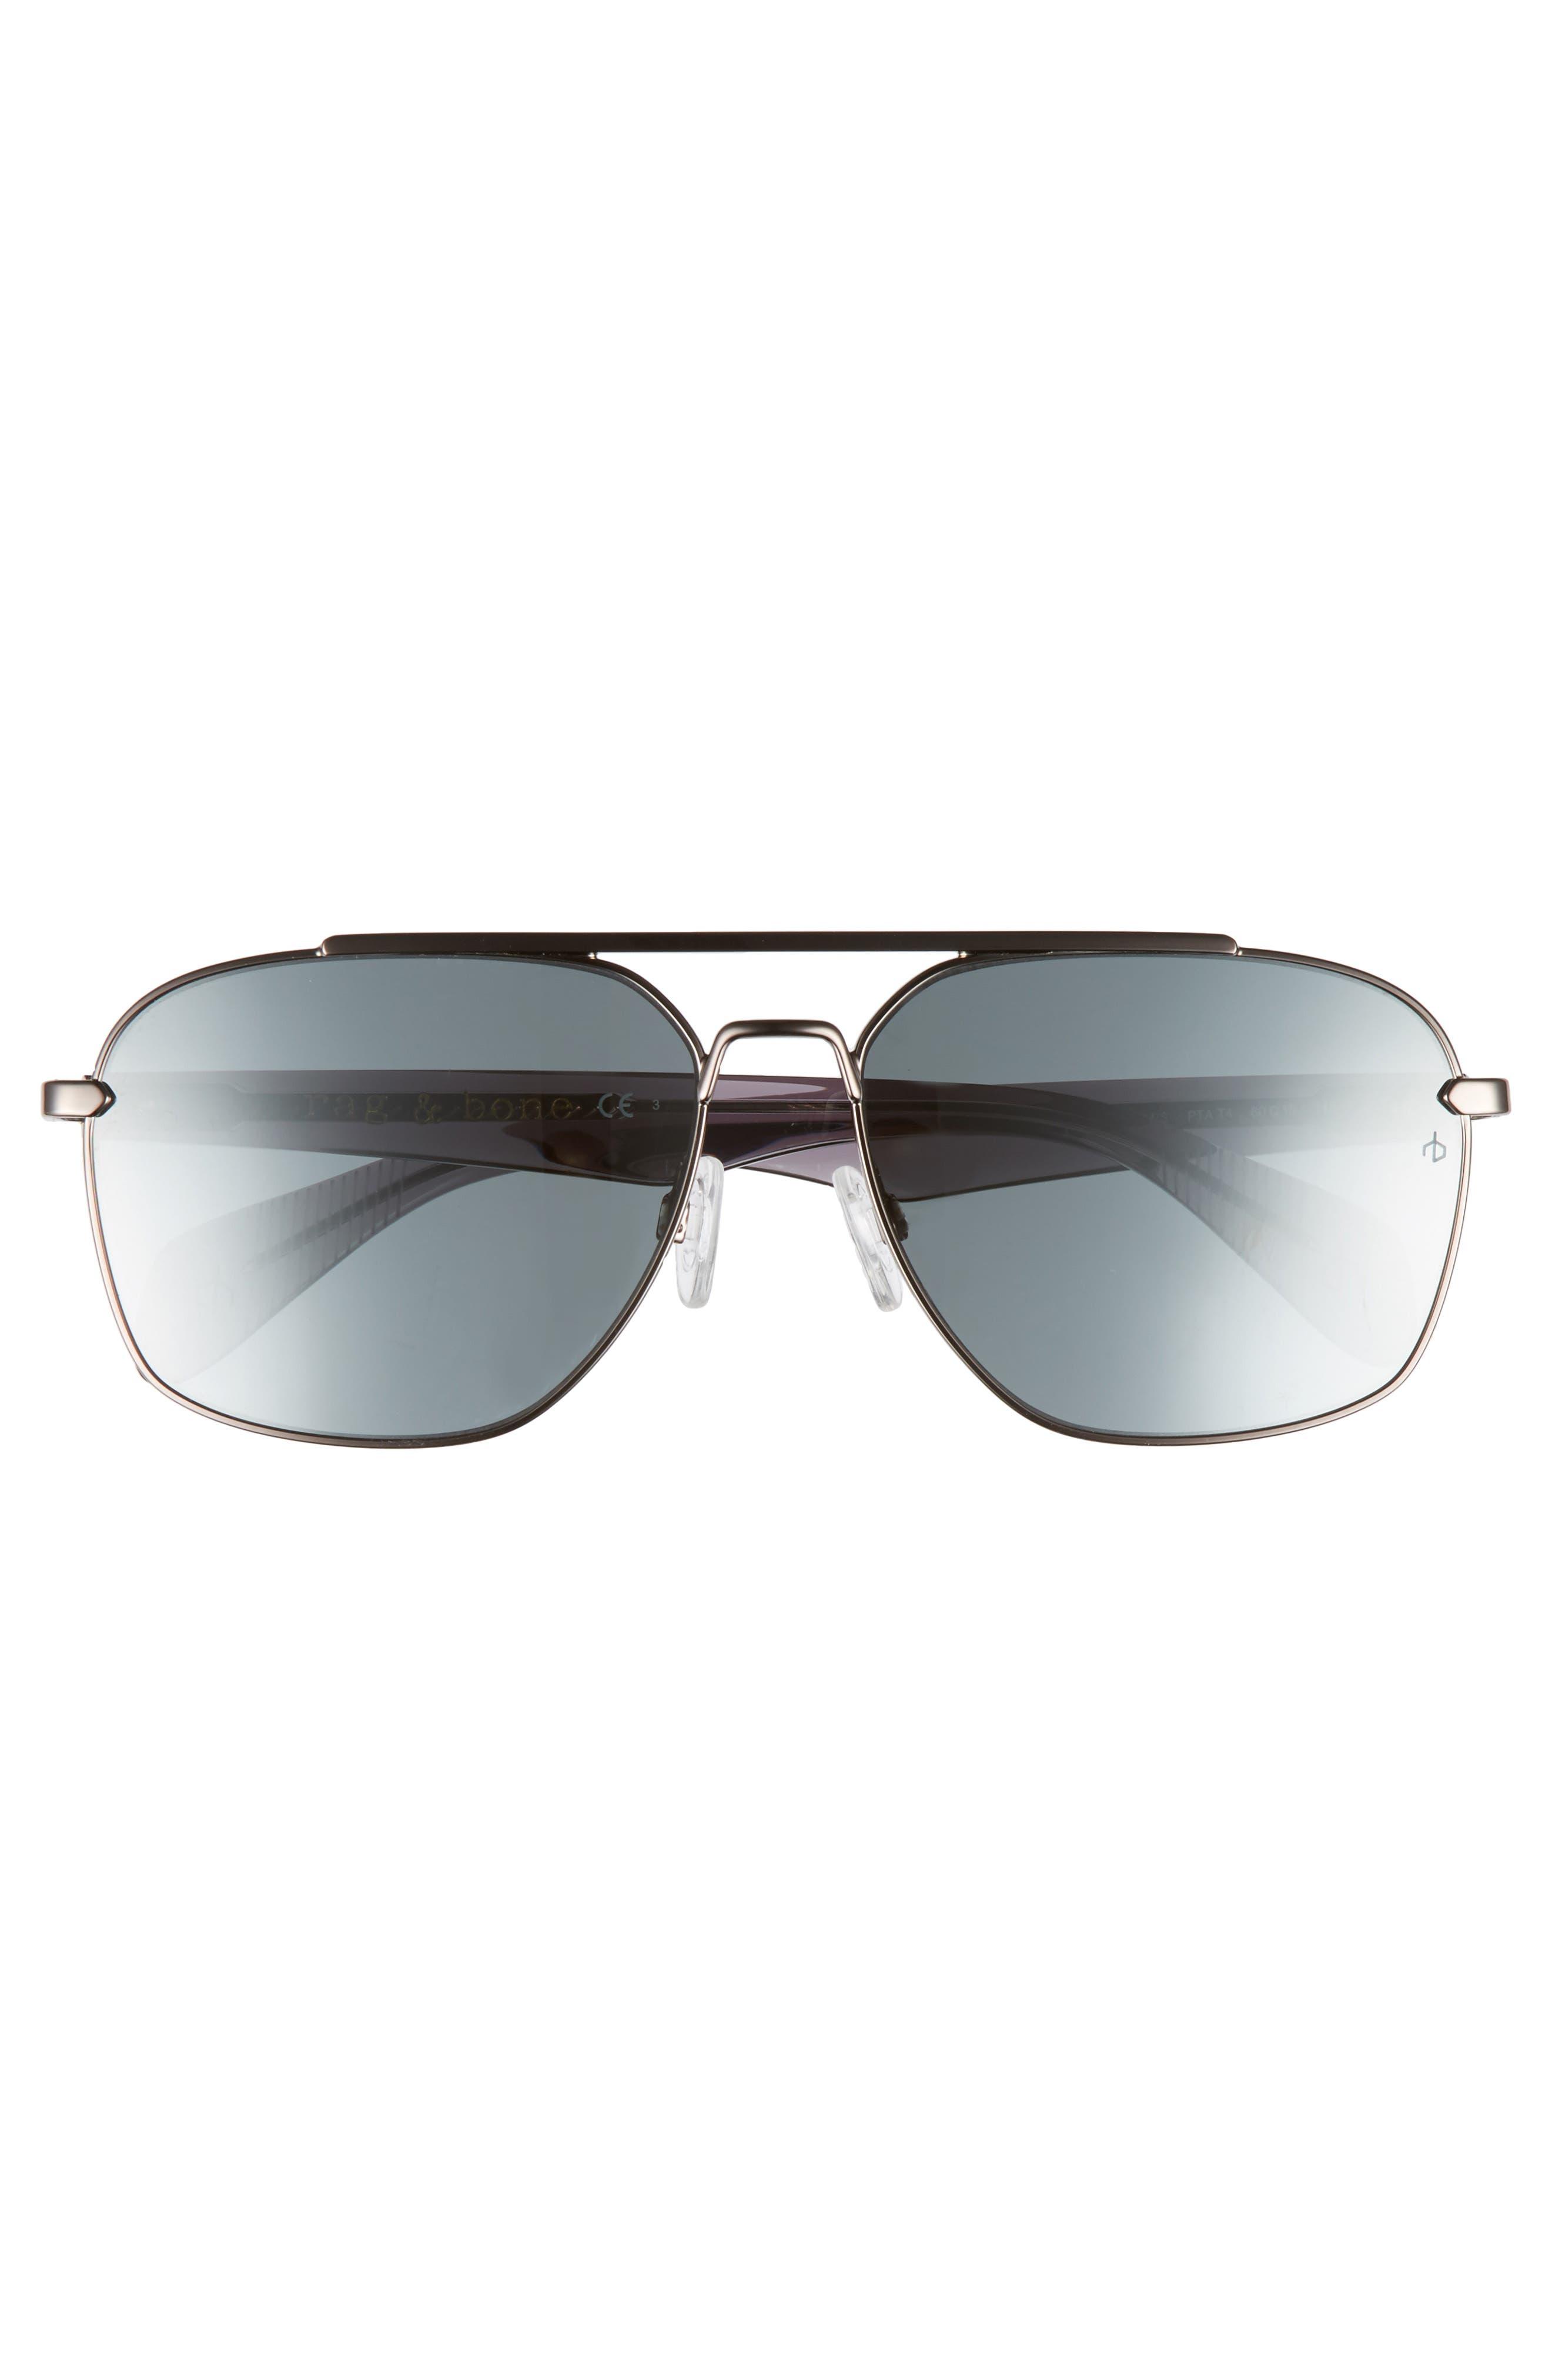 60mm Mirrored Navigator Sunglasses,                             Alternate thumbnail 2, color,                             Matte Ruthenium/ Grey